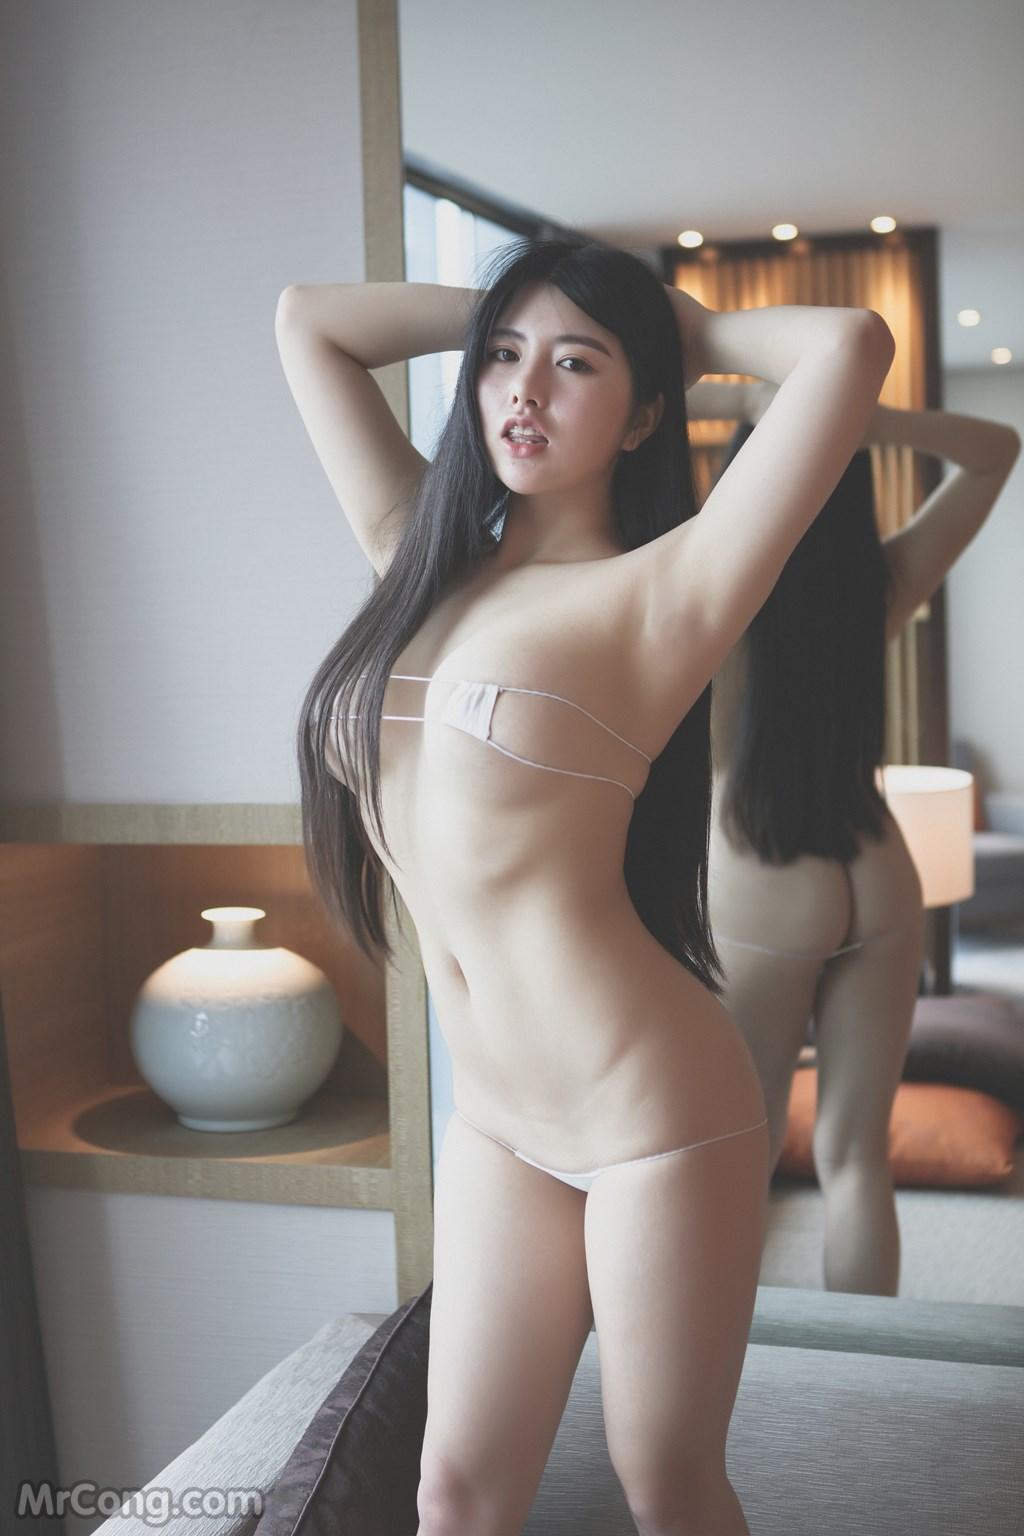 Image BoLoli-2017-06-06-Vol.066-Selena-Na-Lu-MrCong.com-014 in post BoLoli 2017-06-06 Vol.066: Người mẫu Selena (娜露) (35 ảnh)